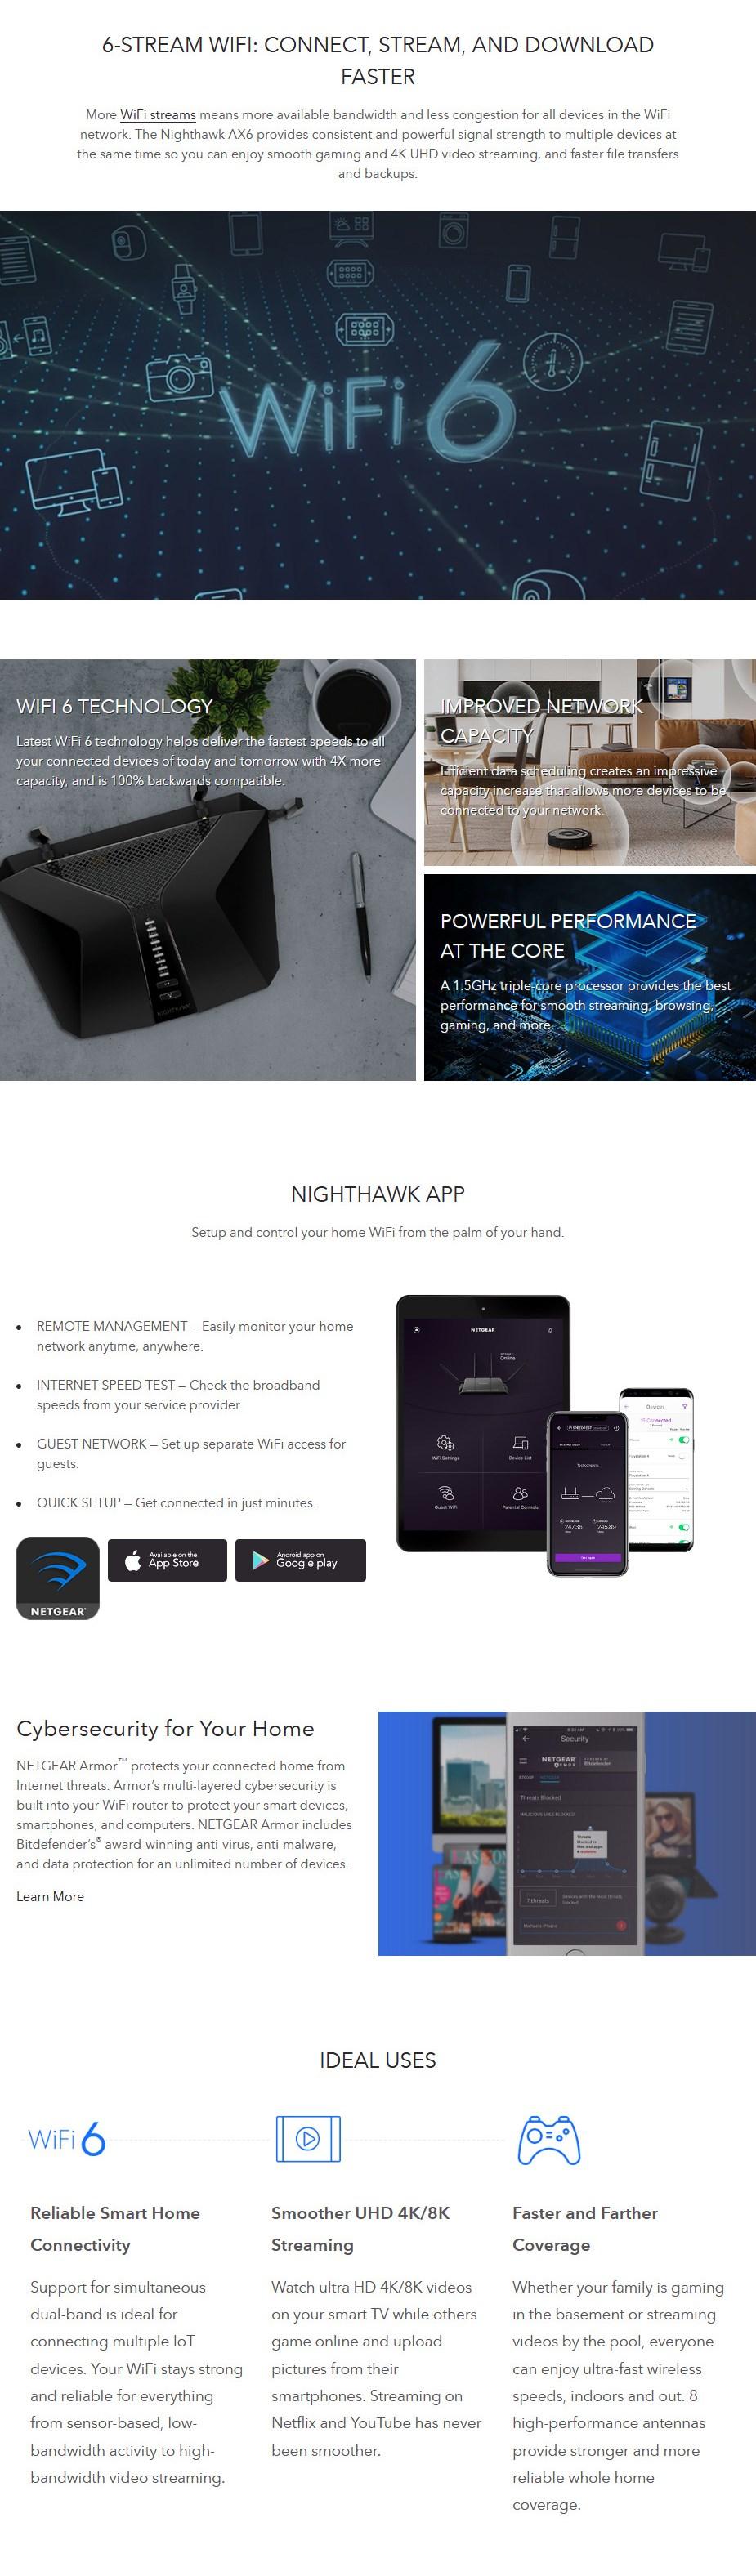 netgear_nighthawk_rax50_ax5400_6stream_wifi_6_router_ac40251_4.jpg